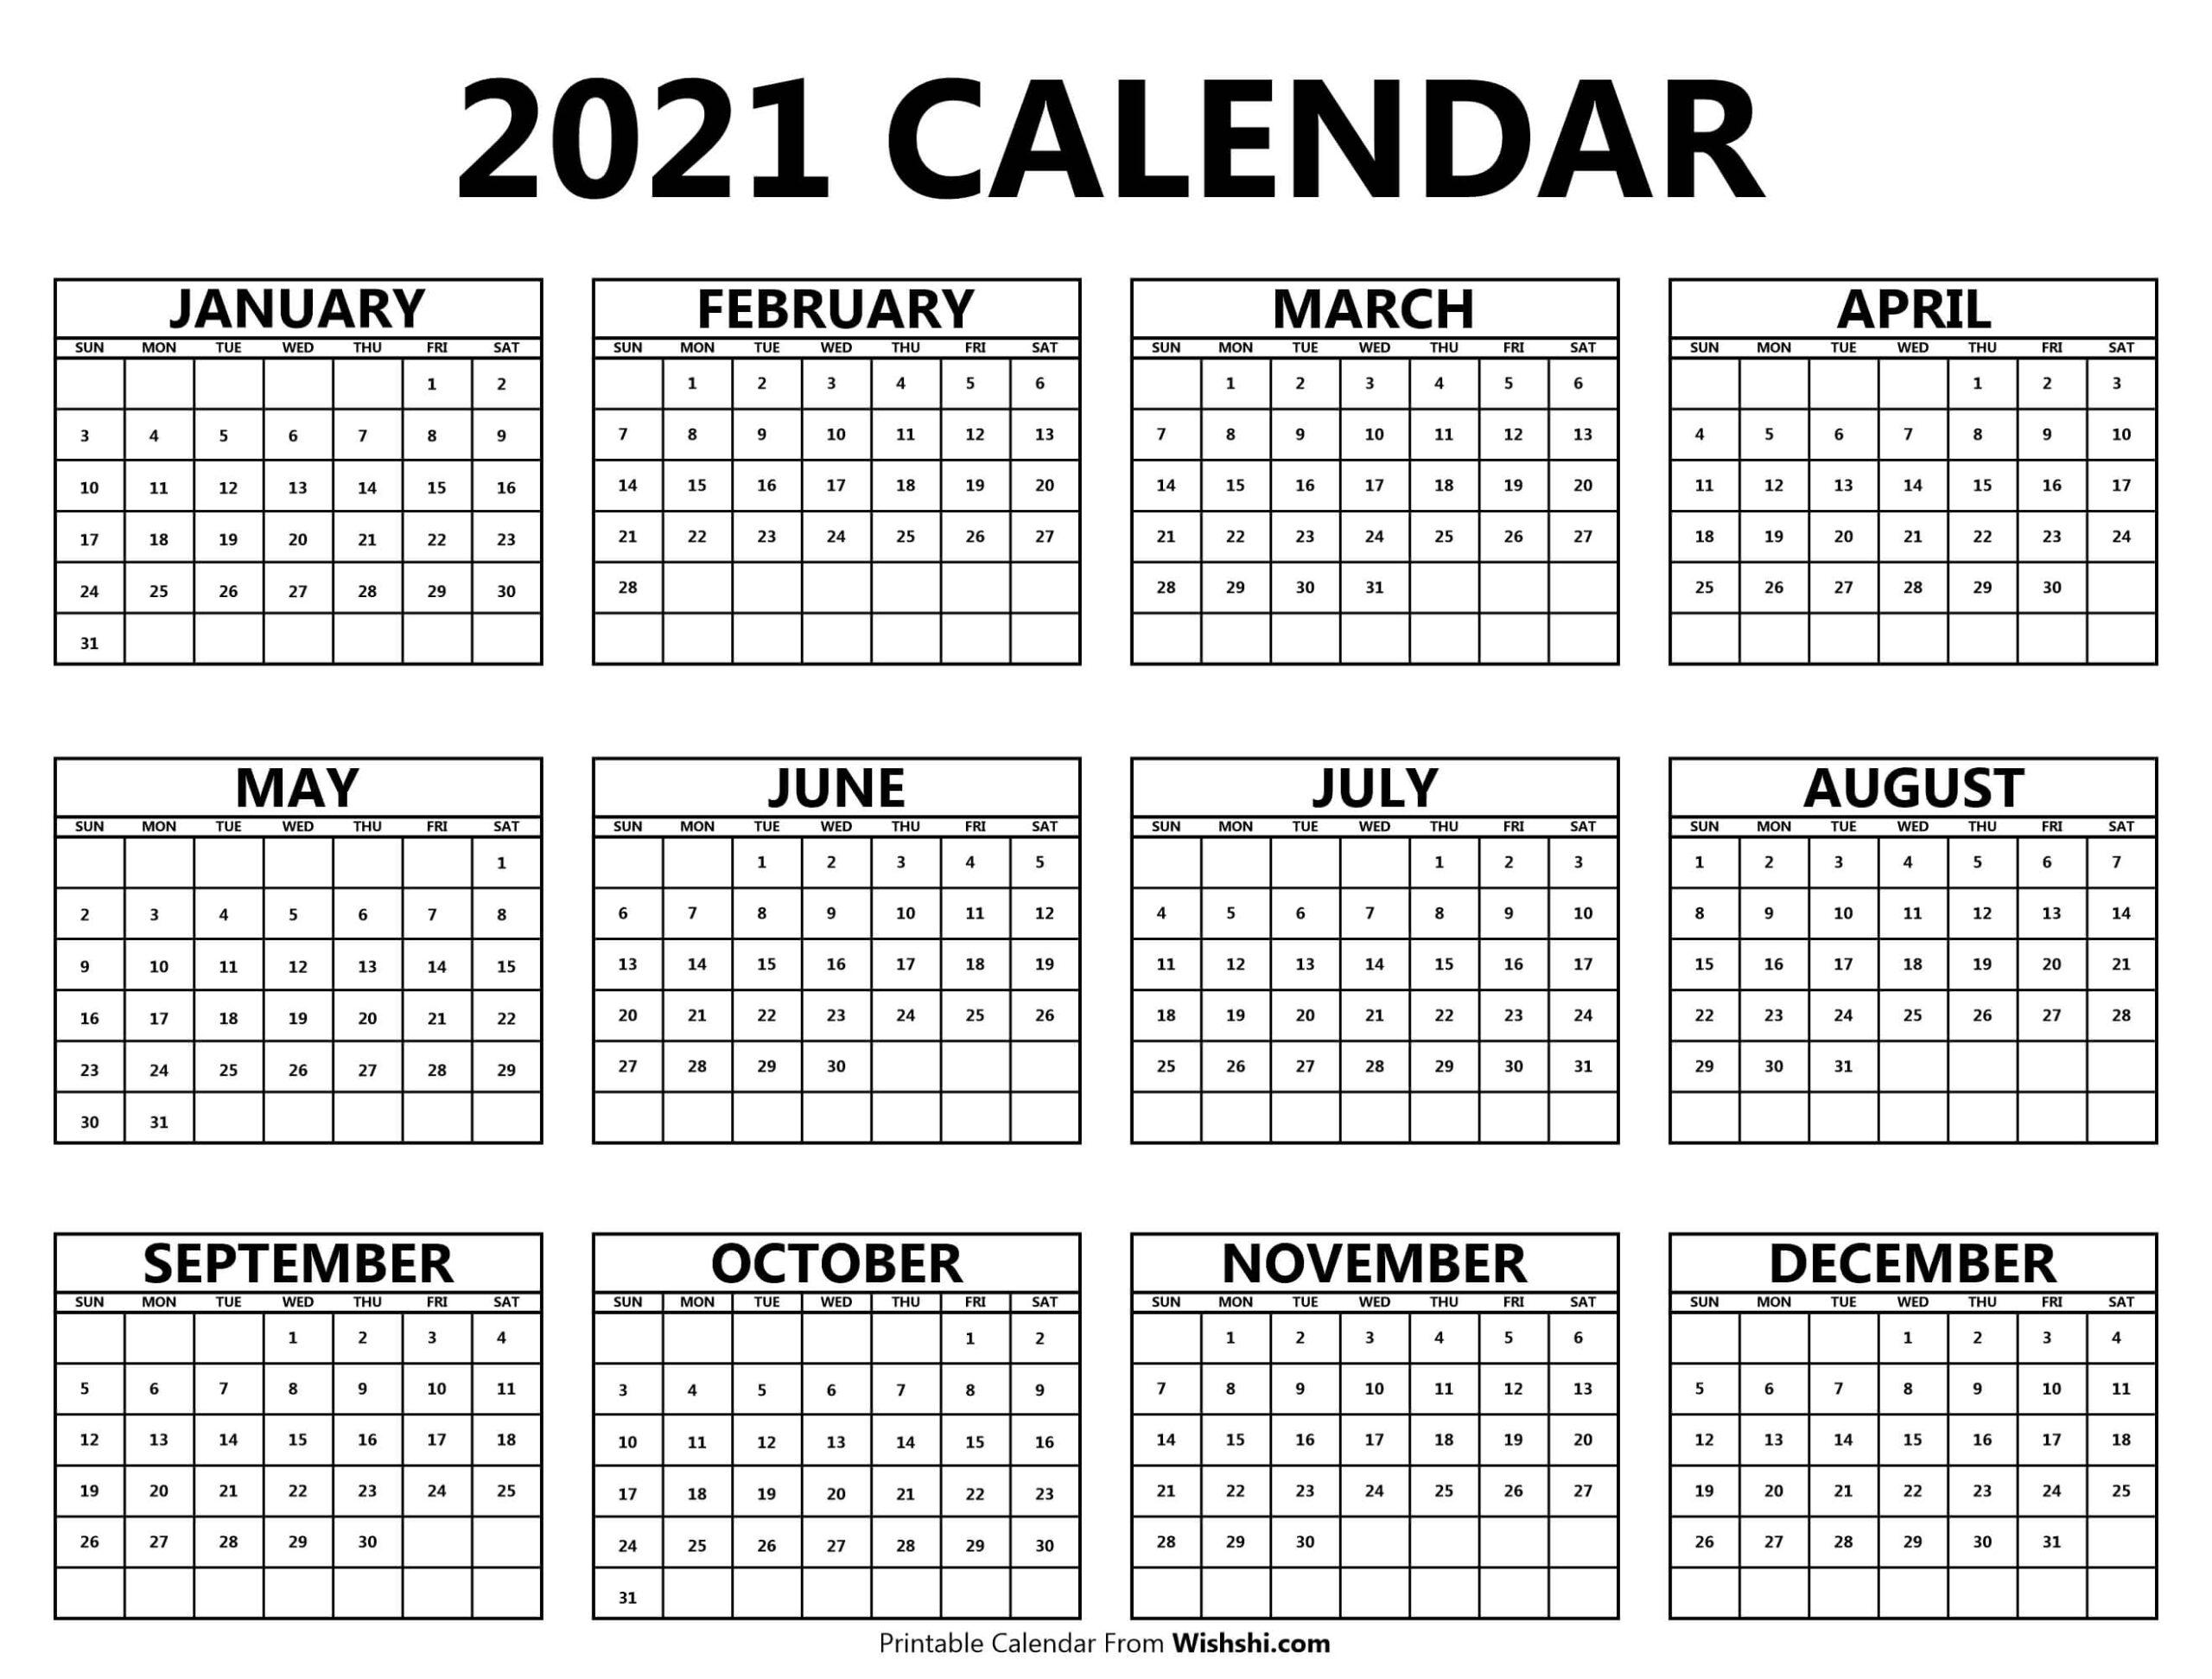 Printable 2021 Yearly Calendar - Free Printable Calendars in Blank 2021 Calendar Printable Free